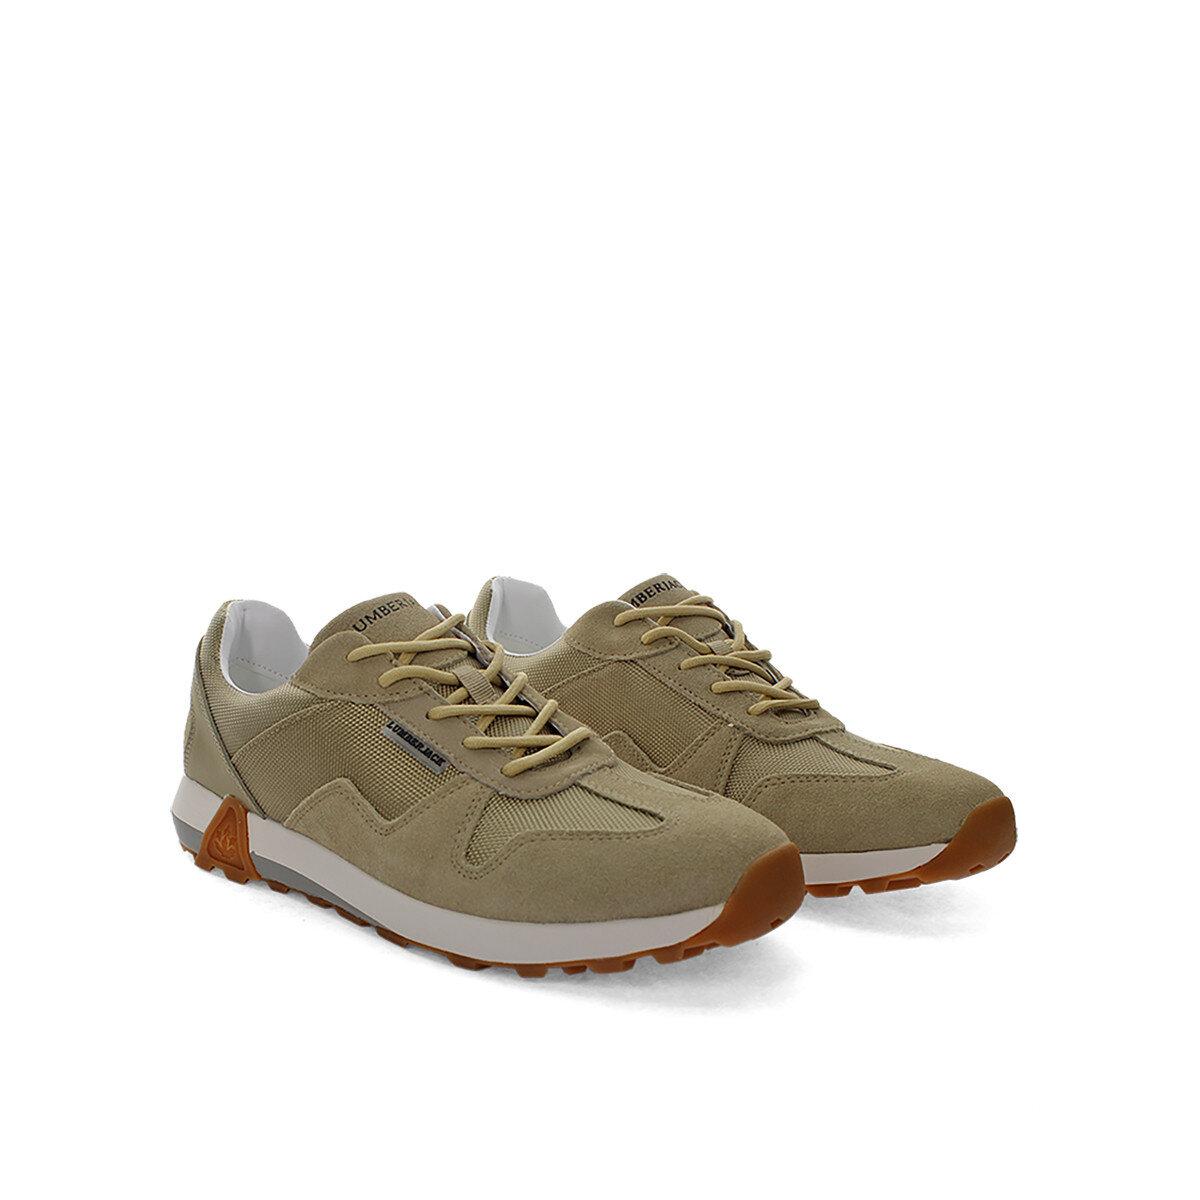 GRANT Sneakers Uomo